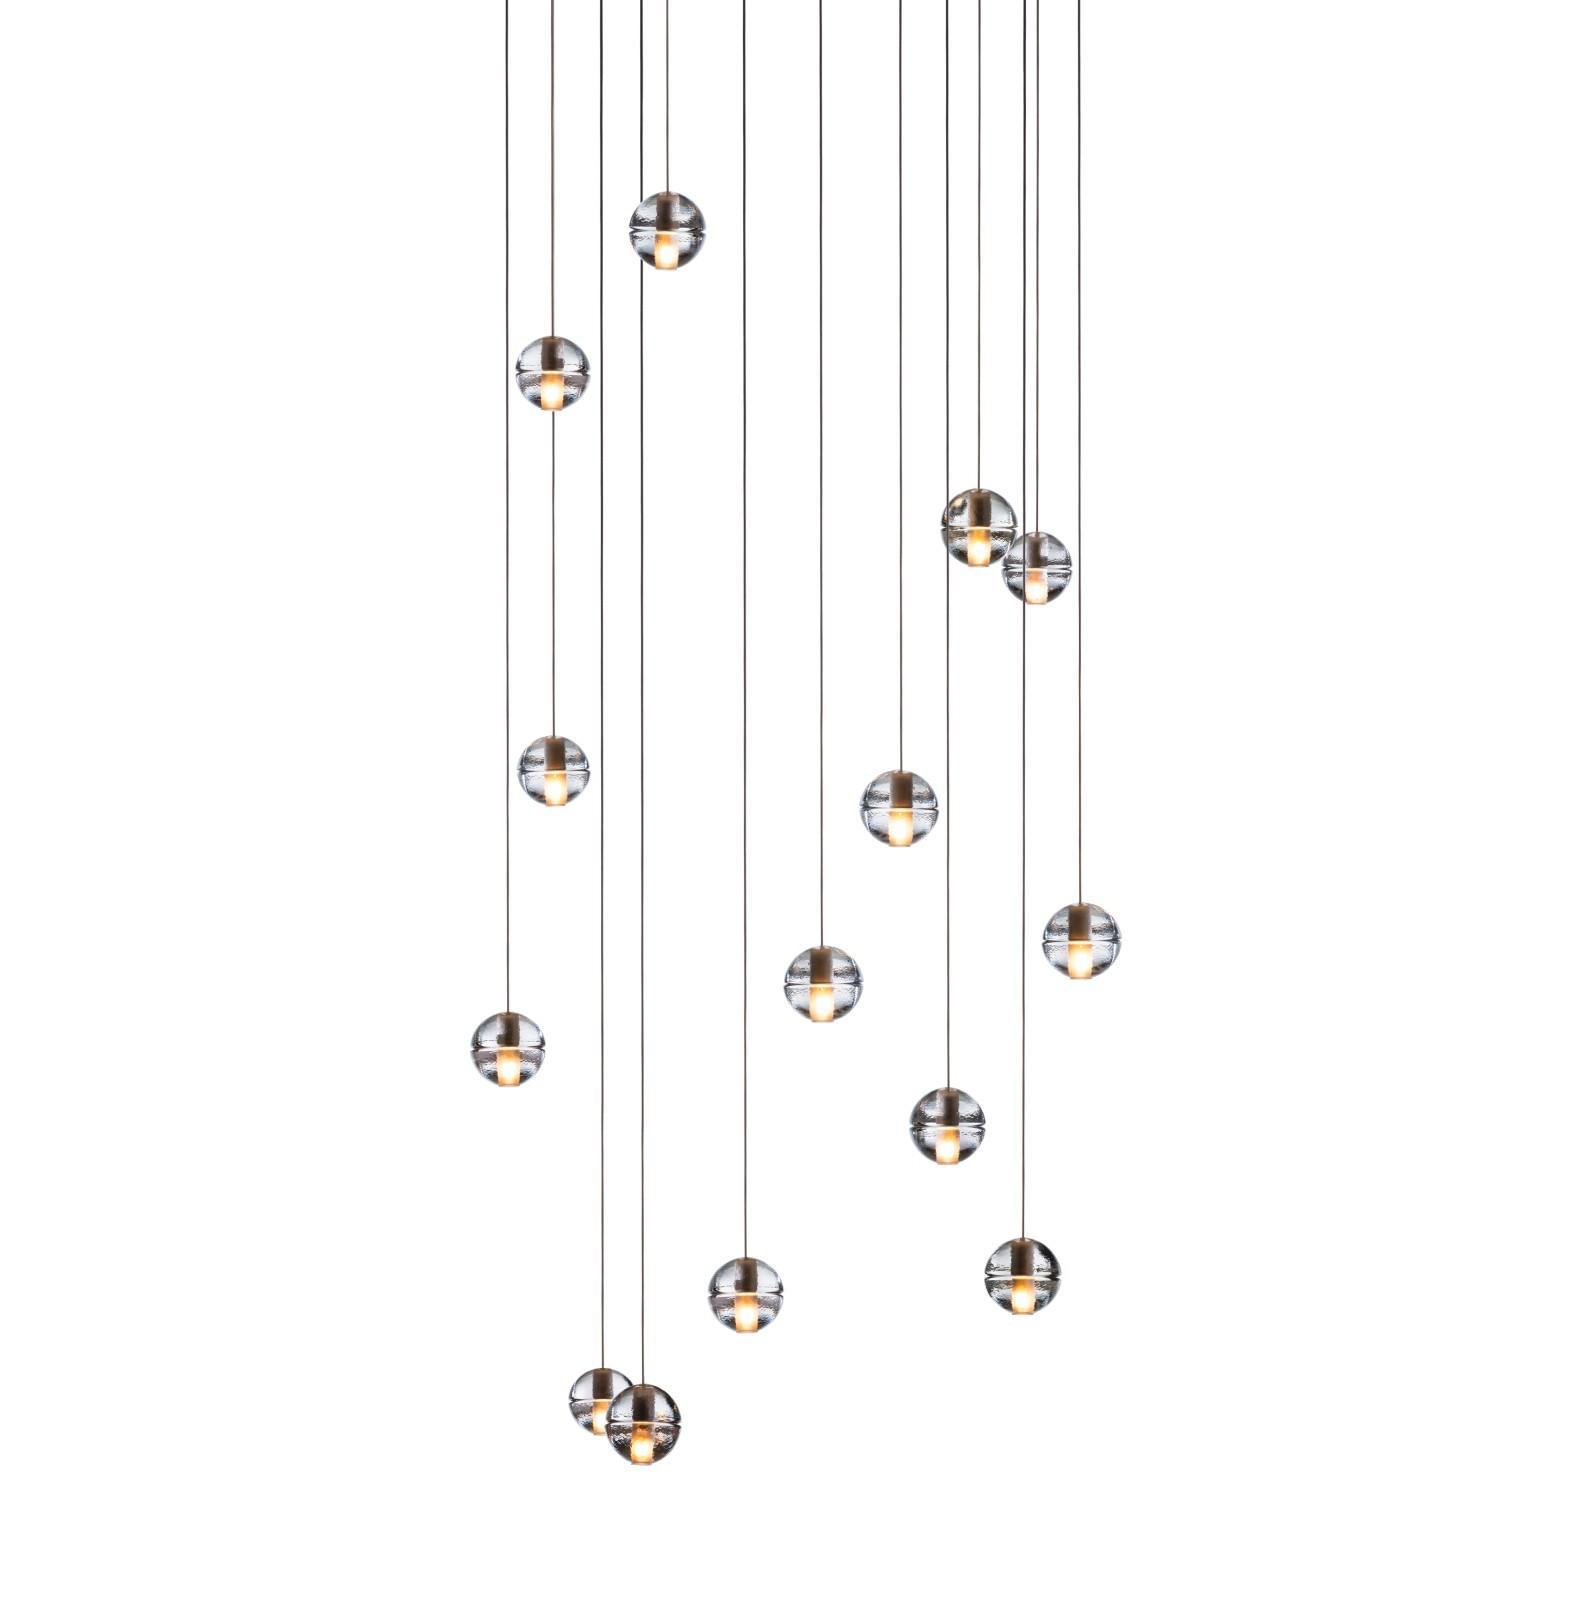 14.14 Rectangular Pendant Chandelier Clear, Xenon